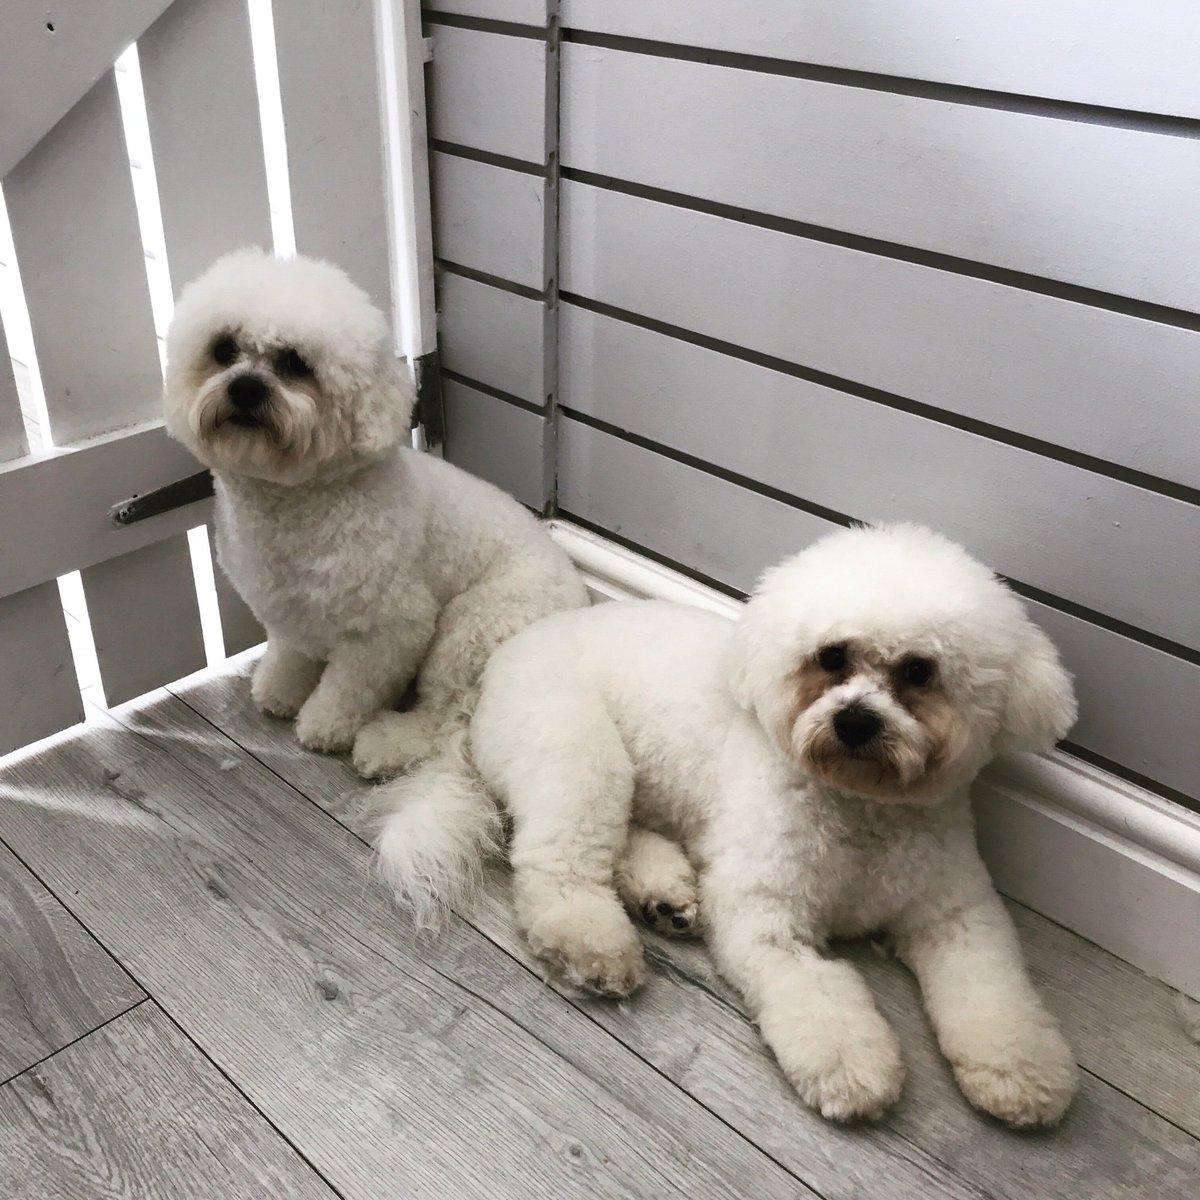 Cuteness Overload  Bertie & Bobby    #DogGroomer #DogGrooming #Bichon #BichonFrise #Puppies #Dogs #DogSpa #DogGroomingSalon #DogOfTheDay #DogLovers #NEFollowers #DogsOfTwitter #NewcastleUponTyne<br>http://pic.twitter.com/1RpeybpWWf